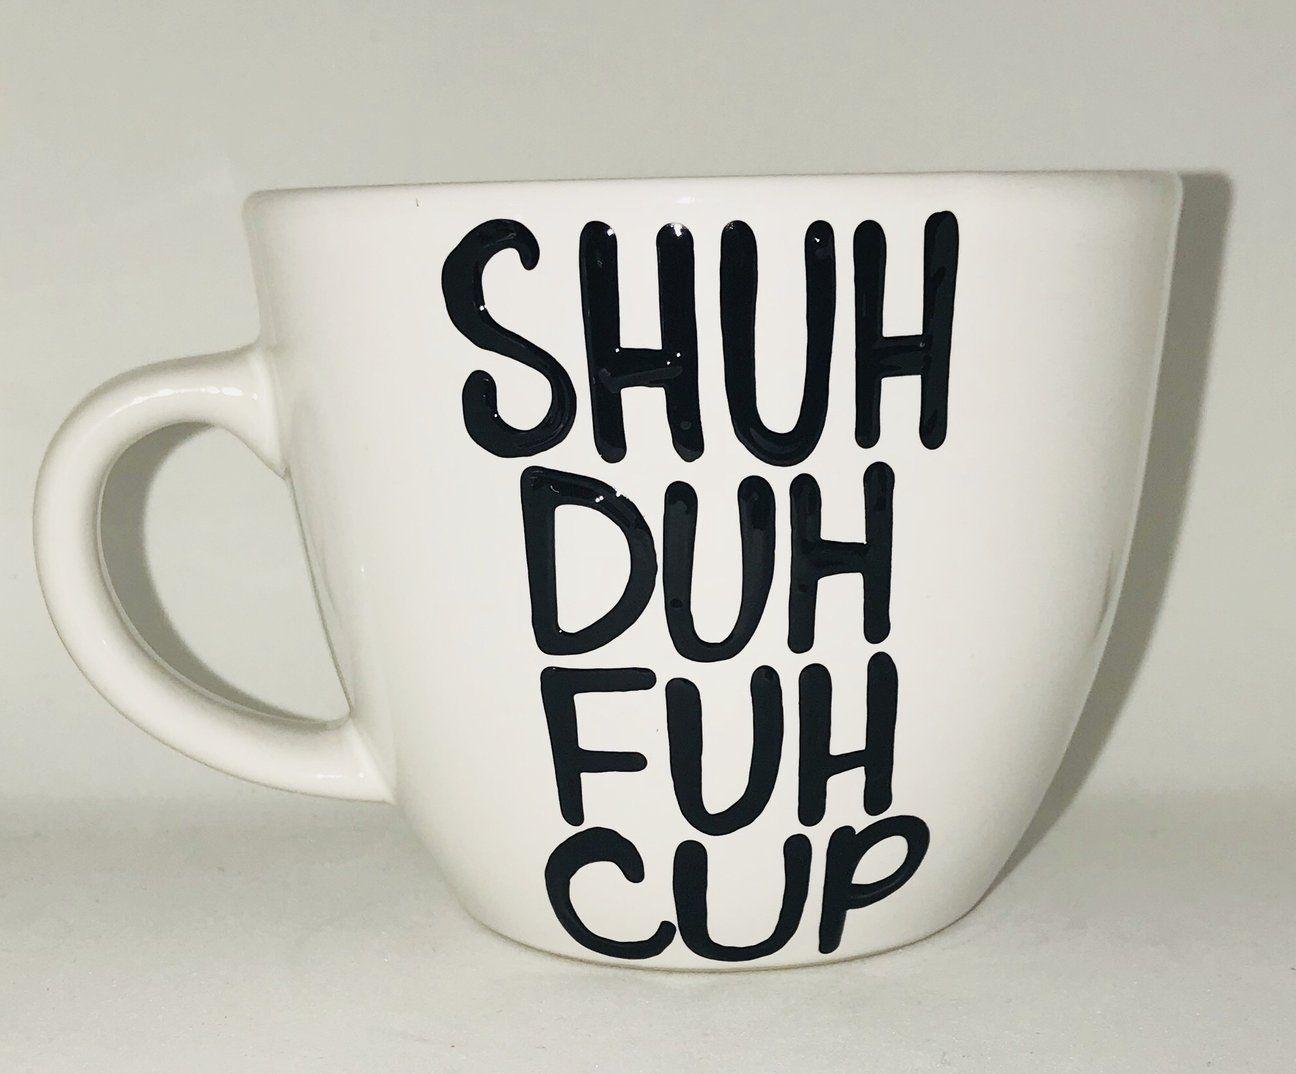 Shuh duh duh cup - Funny Coffee Mugs #funnycoffeemugs